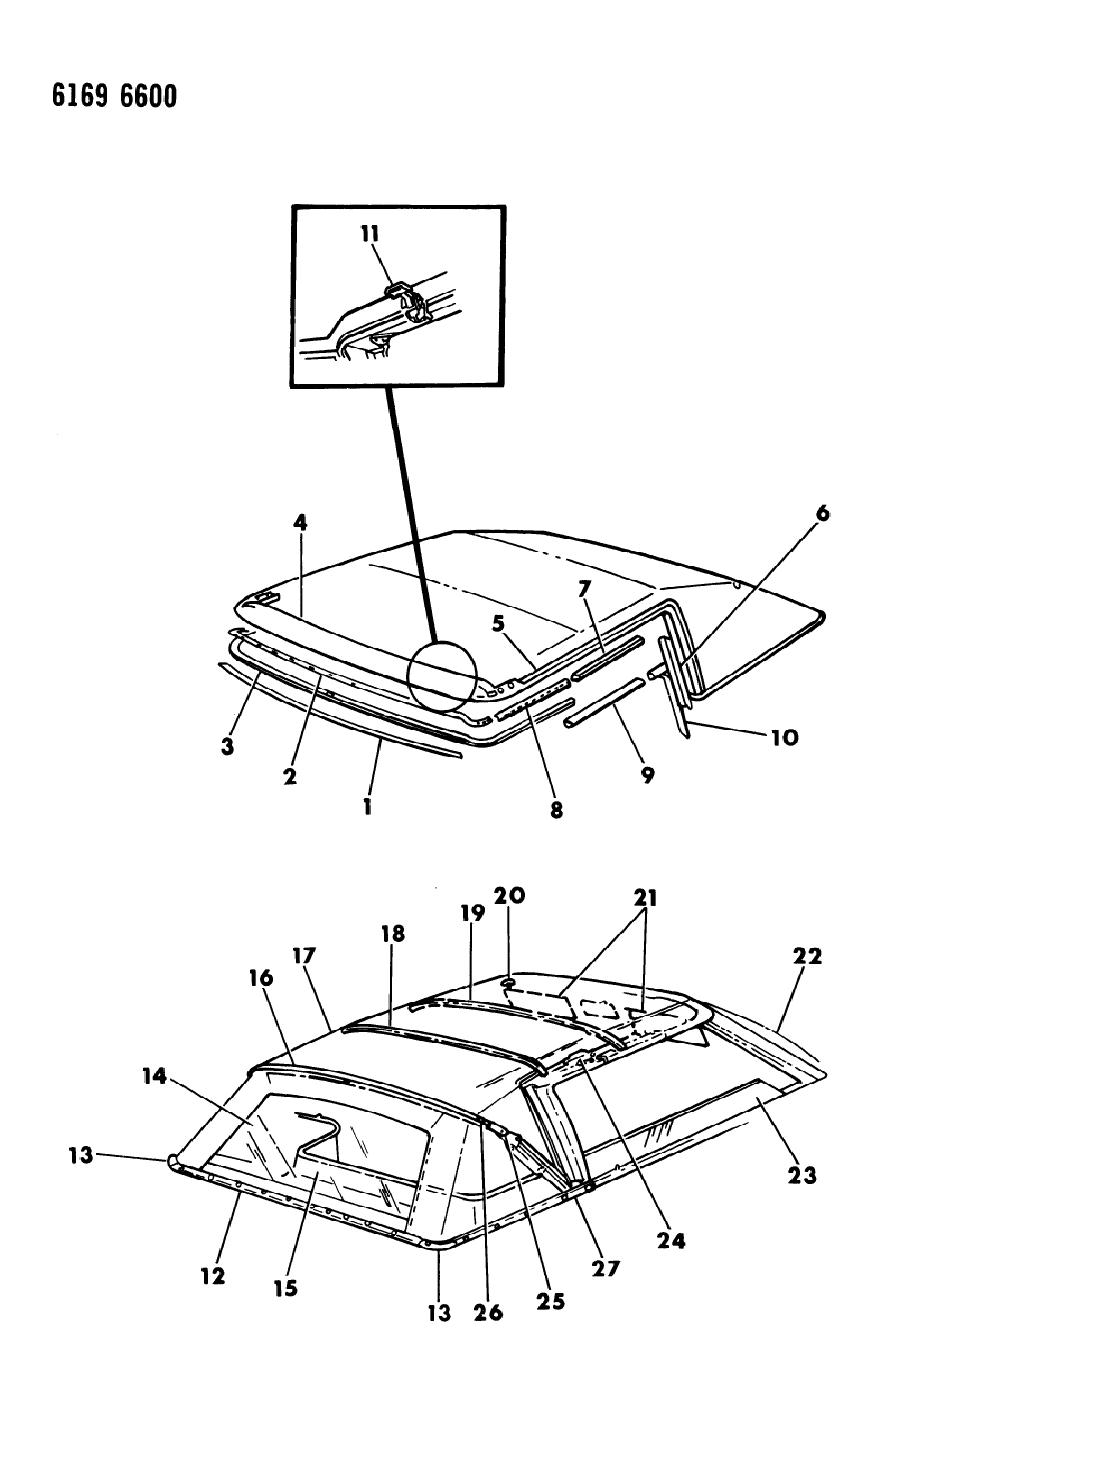 1986 chrysler lebaron base convertible folding top - thumbnail 1